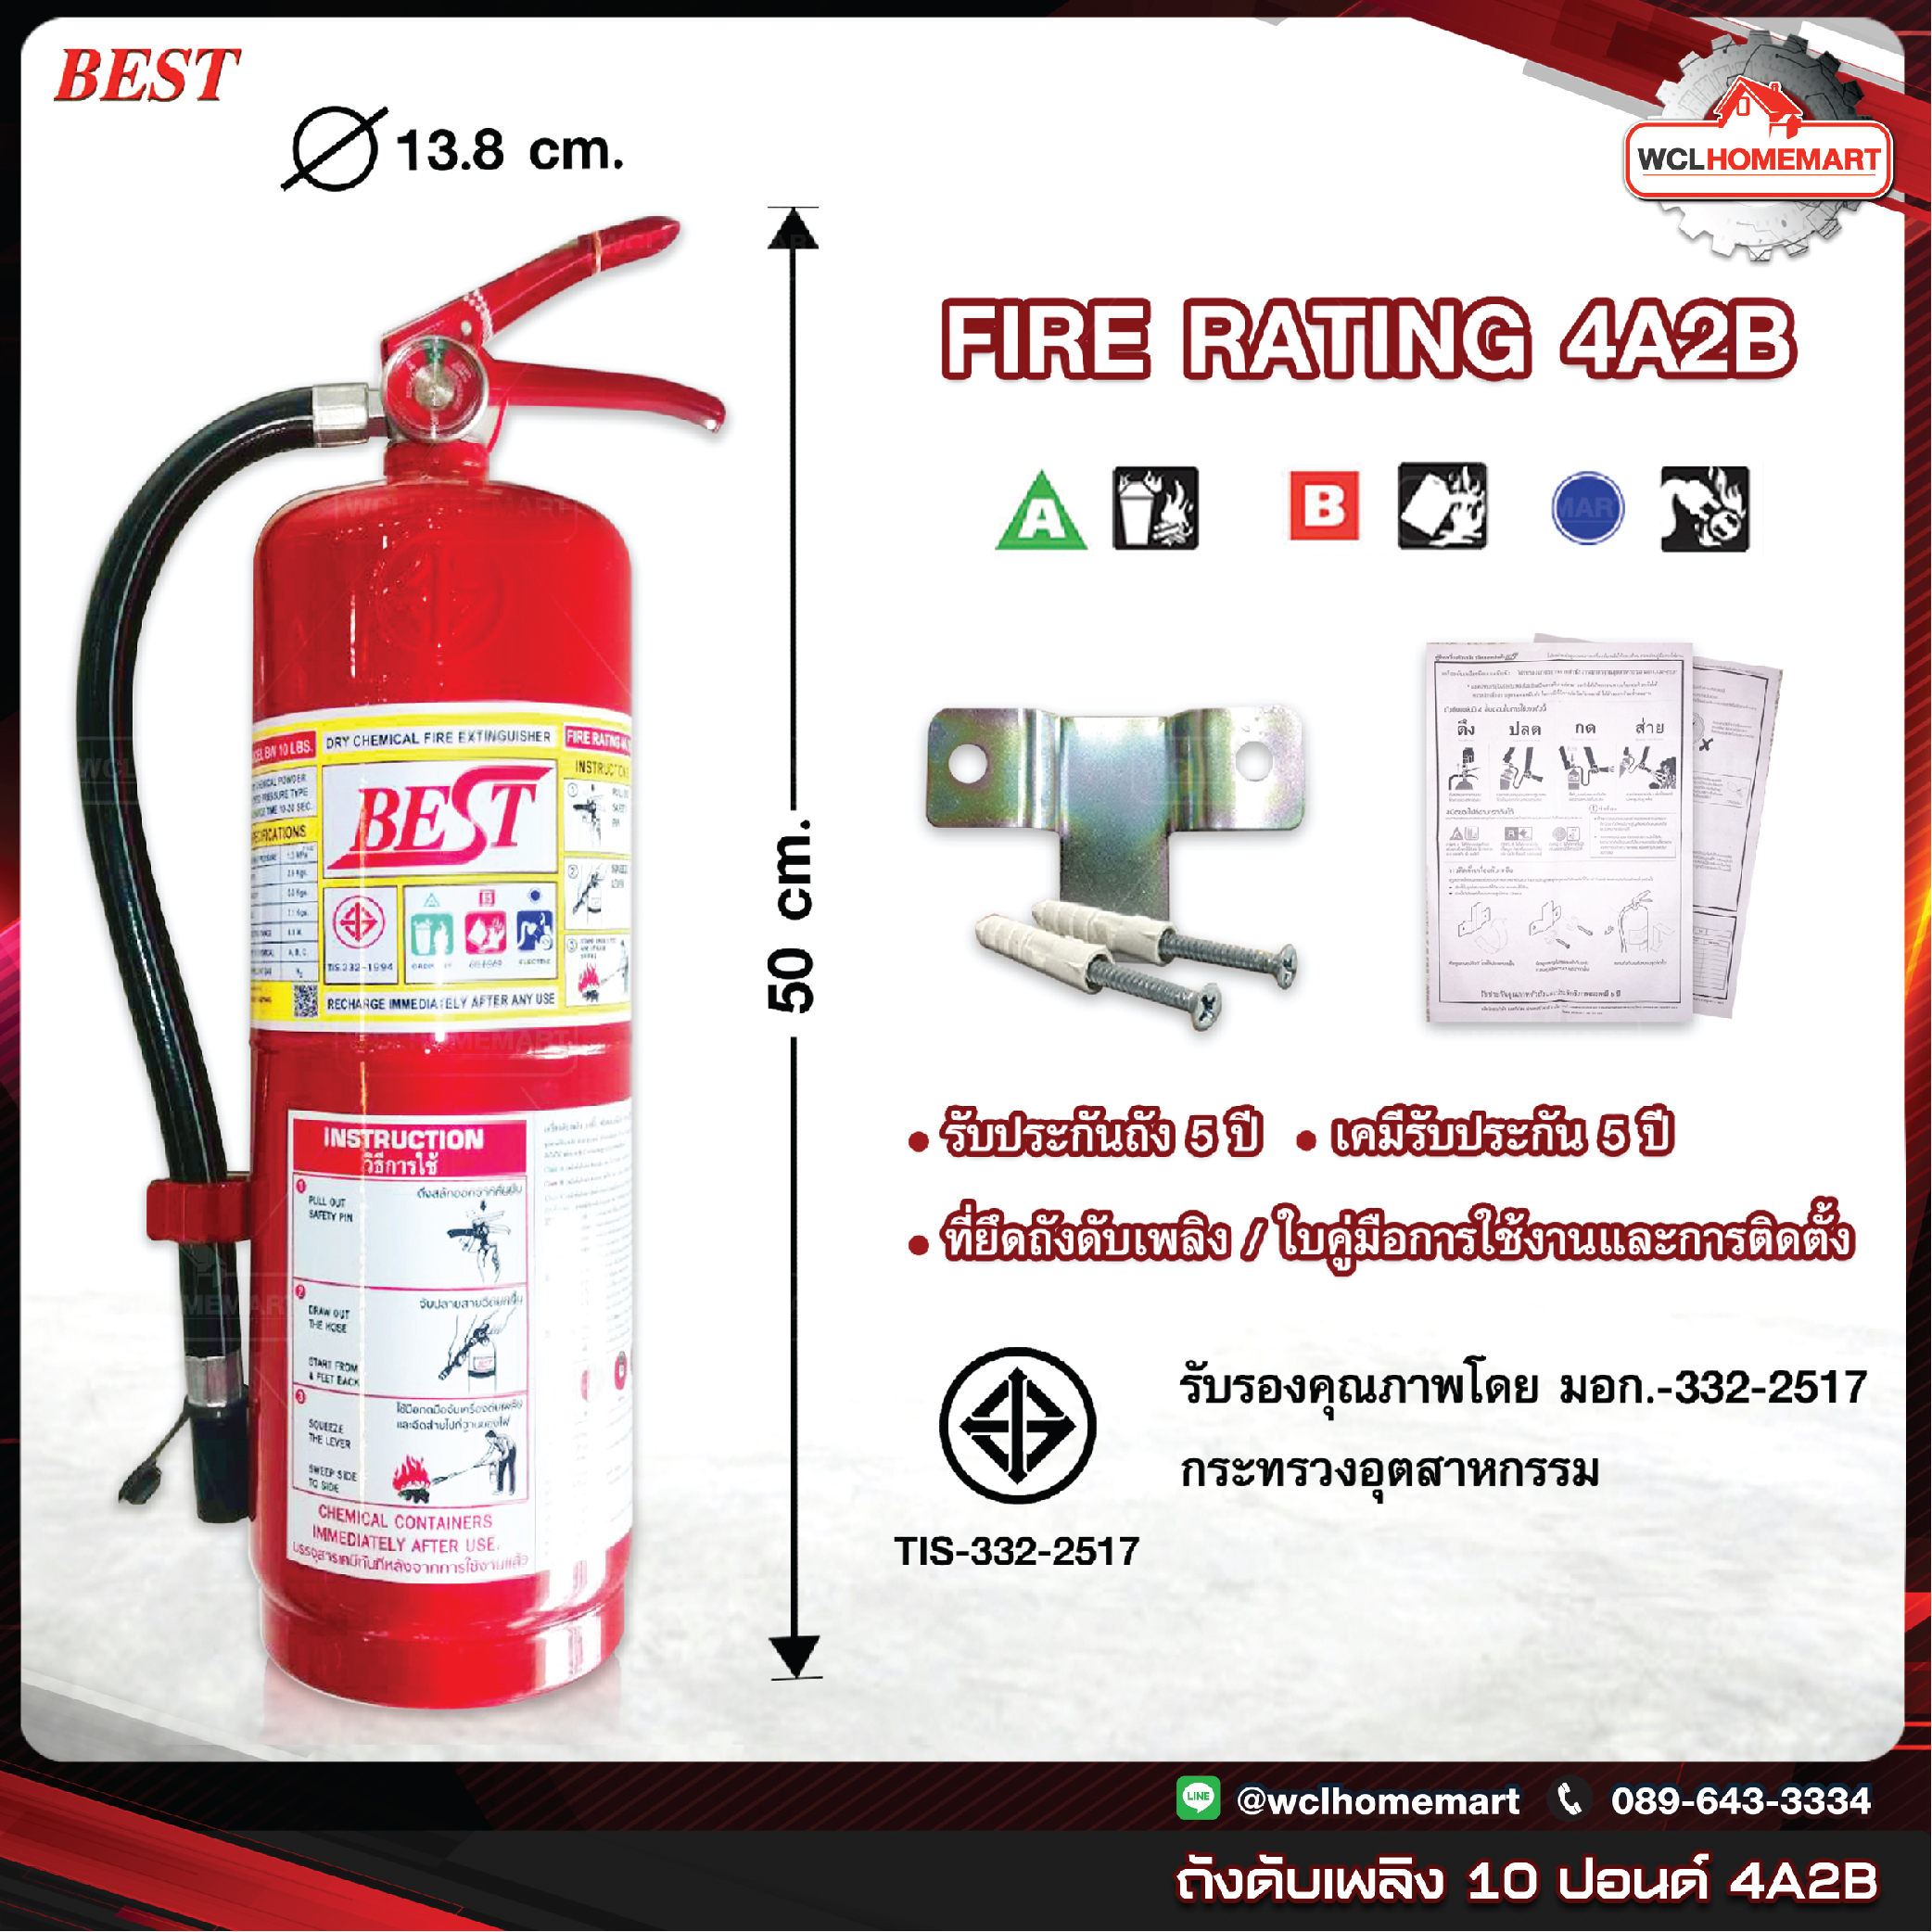 Best เครื่องดับเพลิง 10ปอนด์ 4A2B ถัง ดับเพลิง Dry Chemical Fire Extinguisher – Red เครื่องดับเพลิง